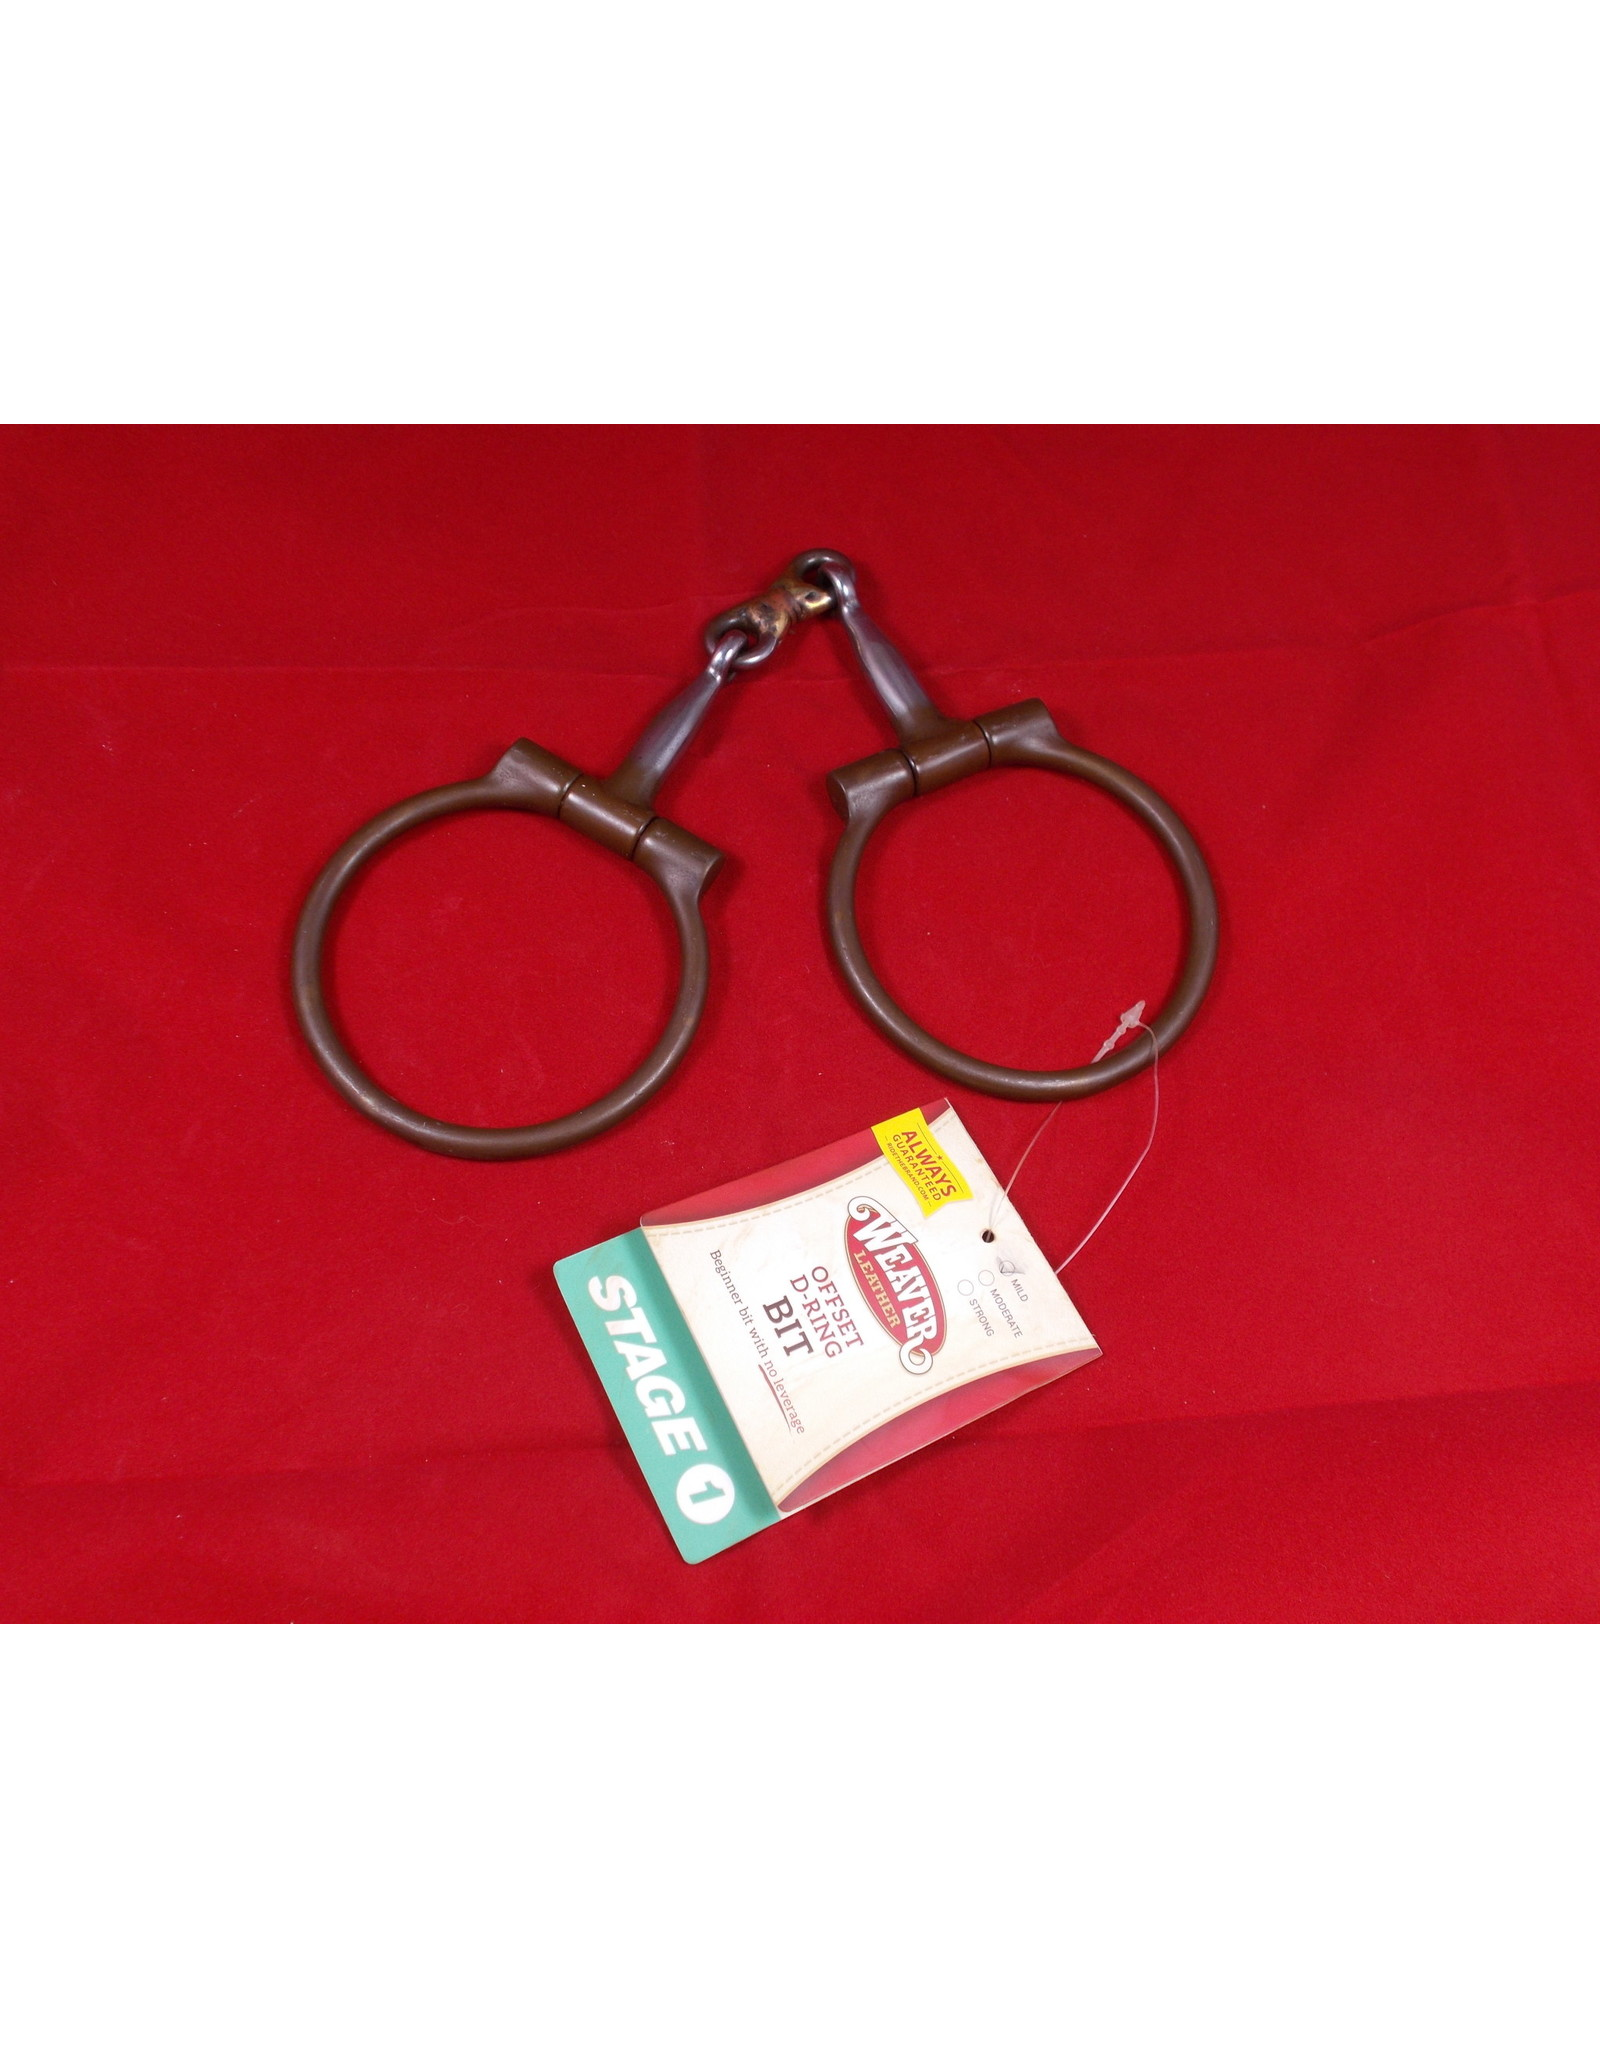 BIT*offset D-ring 25-1903 *9999P 25-1903